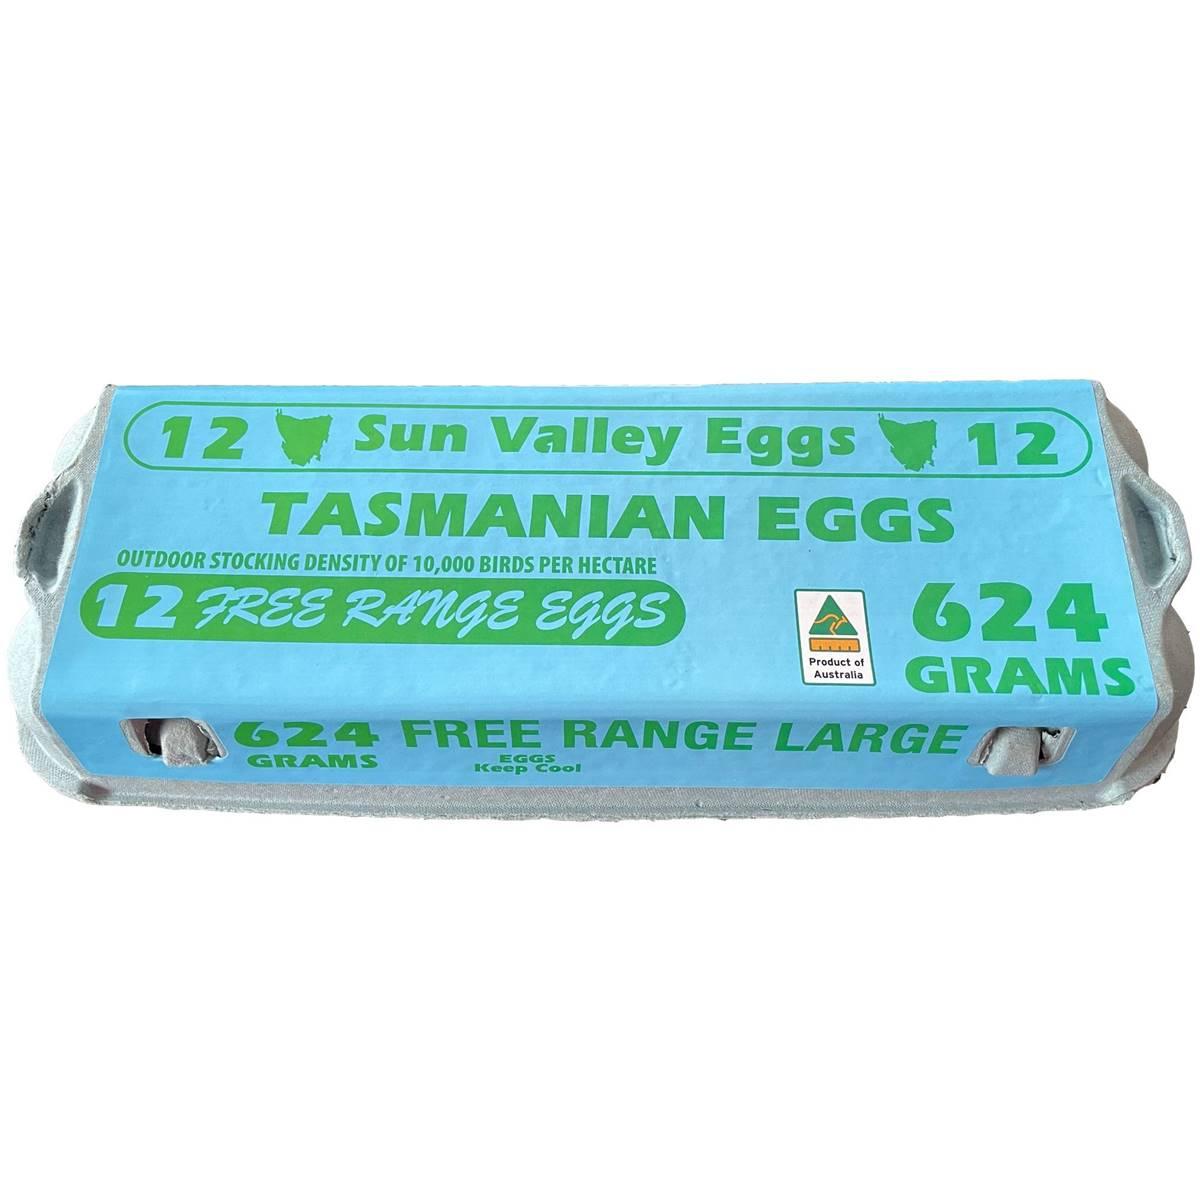 Sun Valley 12 Large Free Range Eggs